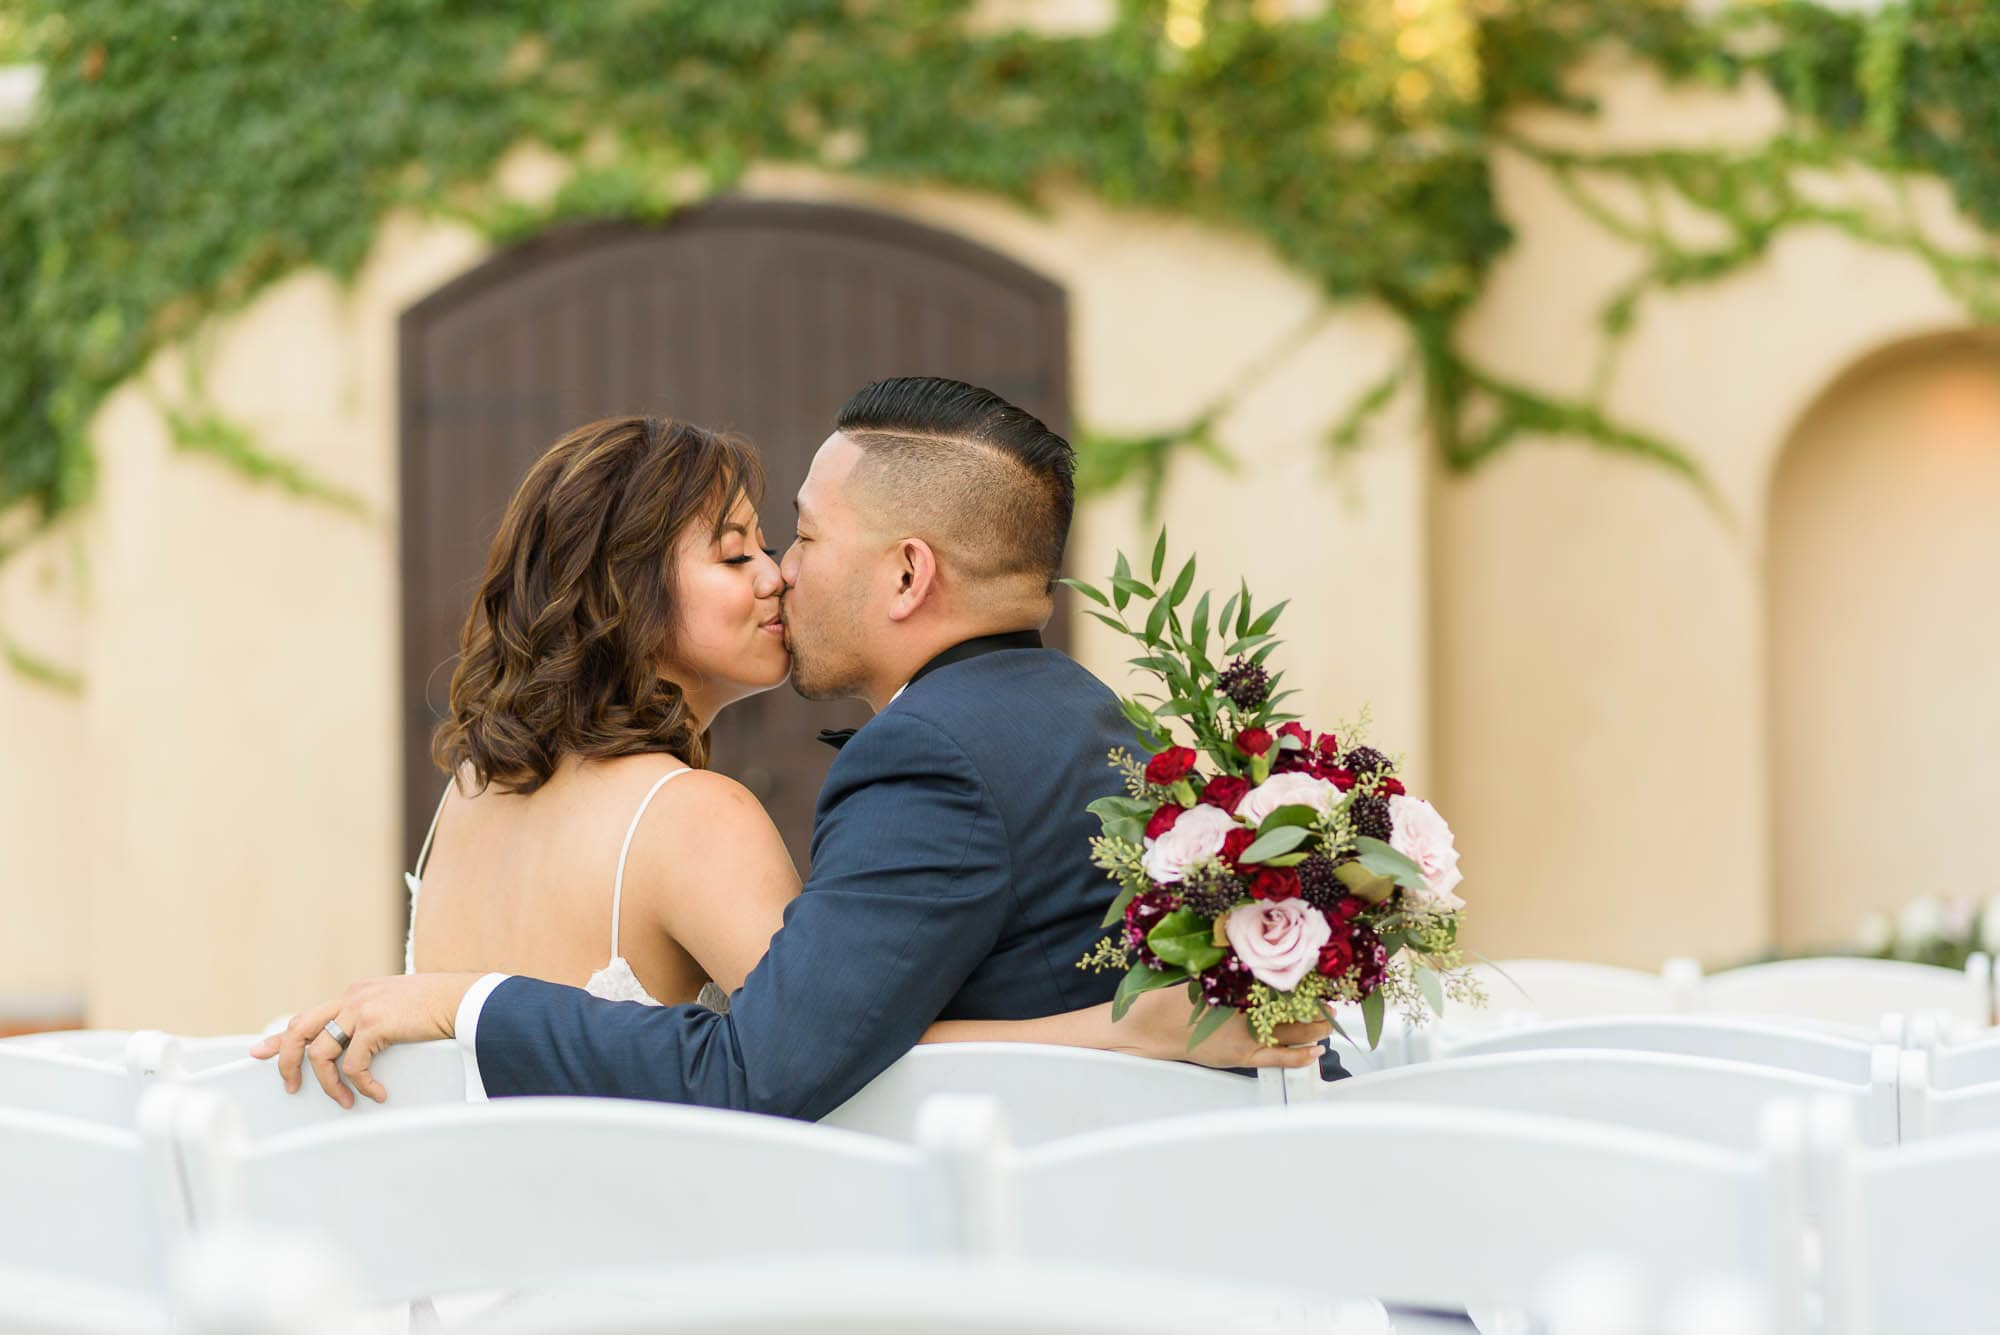 042_Alan_and_Heidi_Wedding_Karla_Paolo